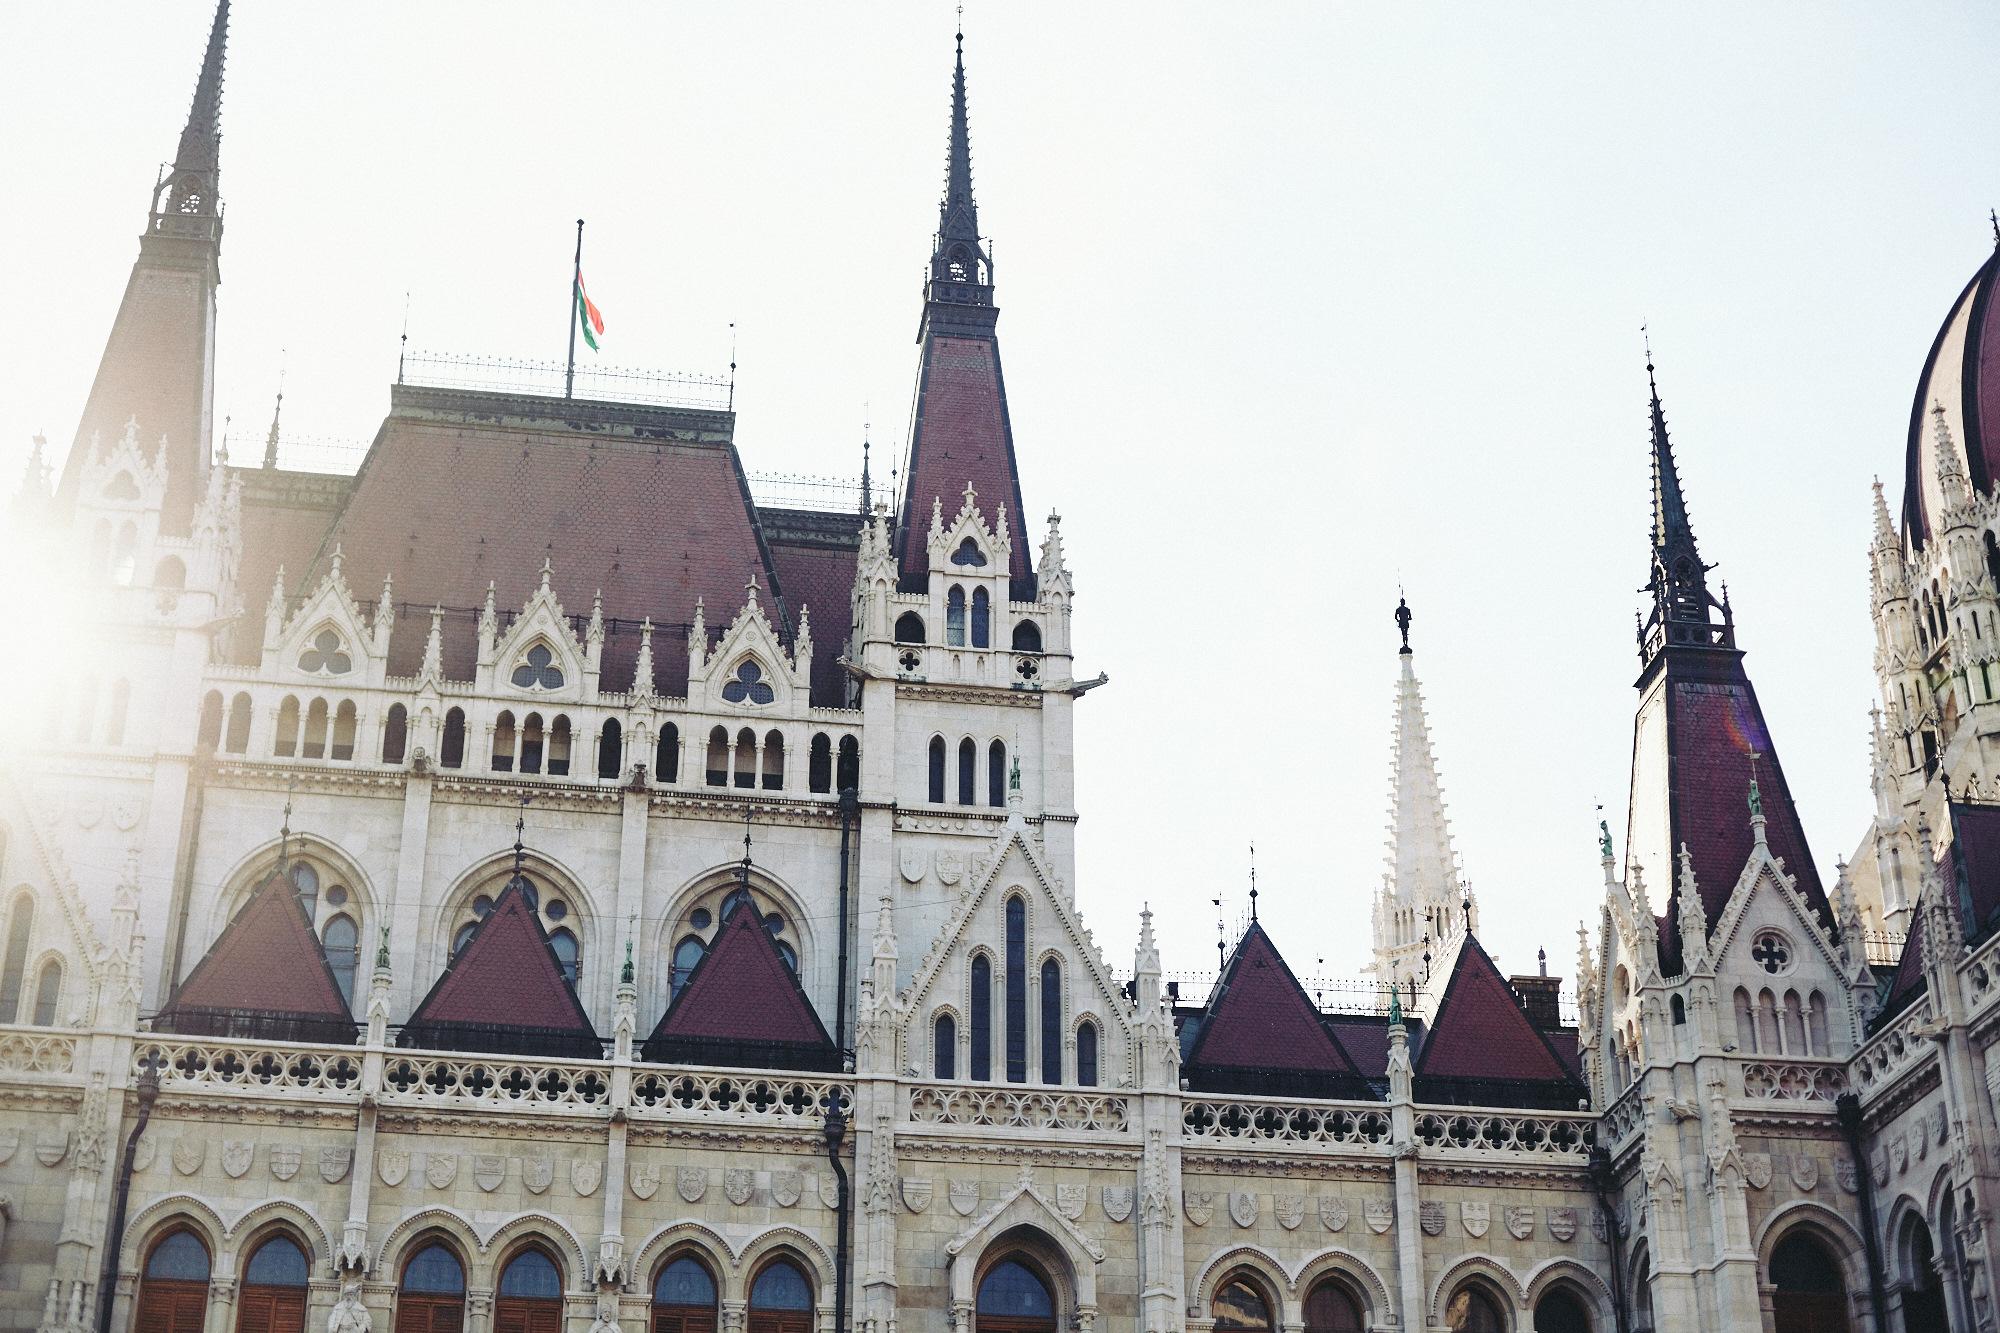 maxmotel_budapest_aug2015_day01_04_parliament_0168